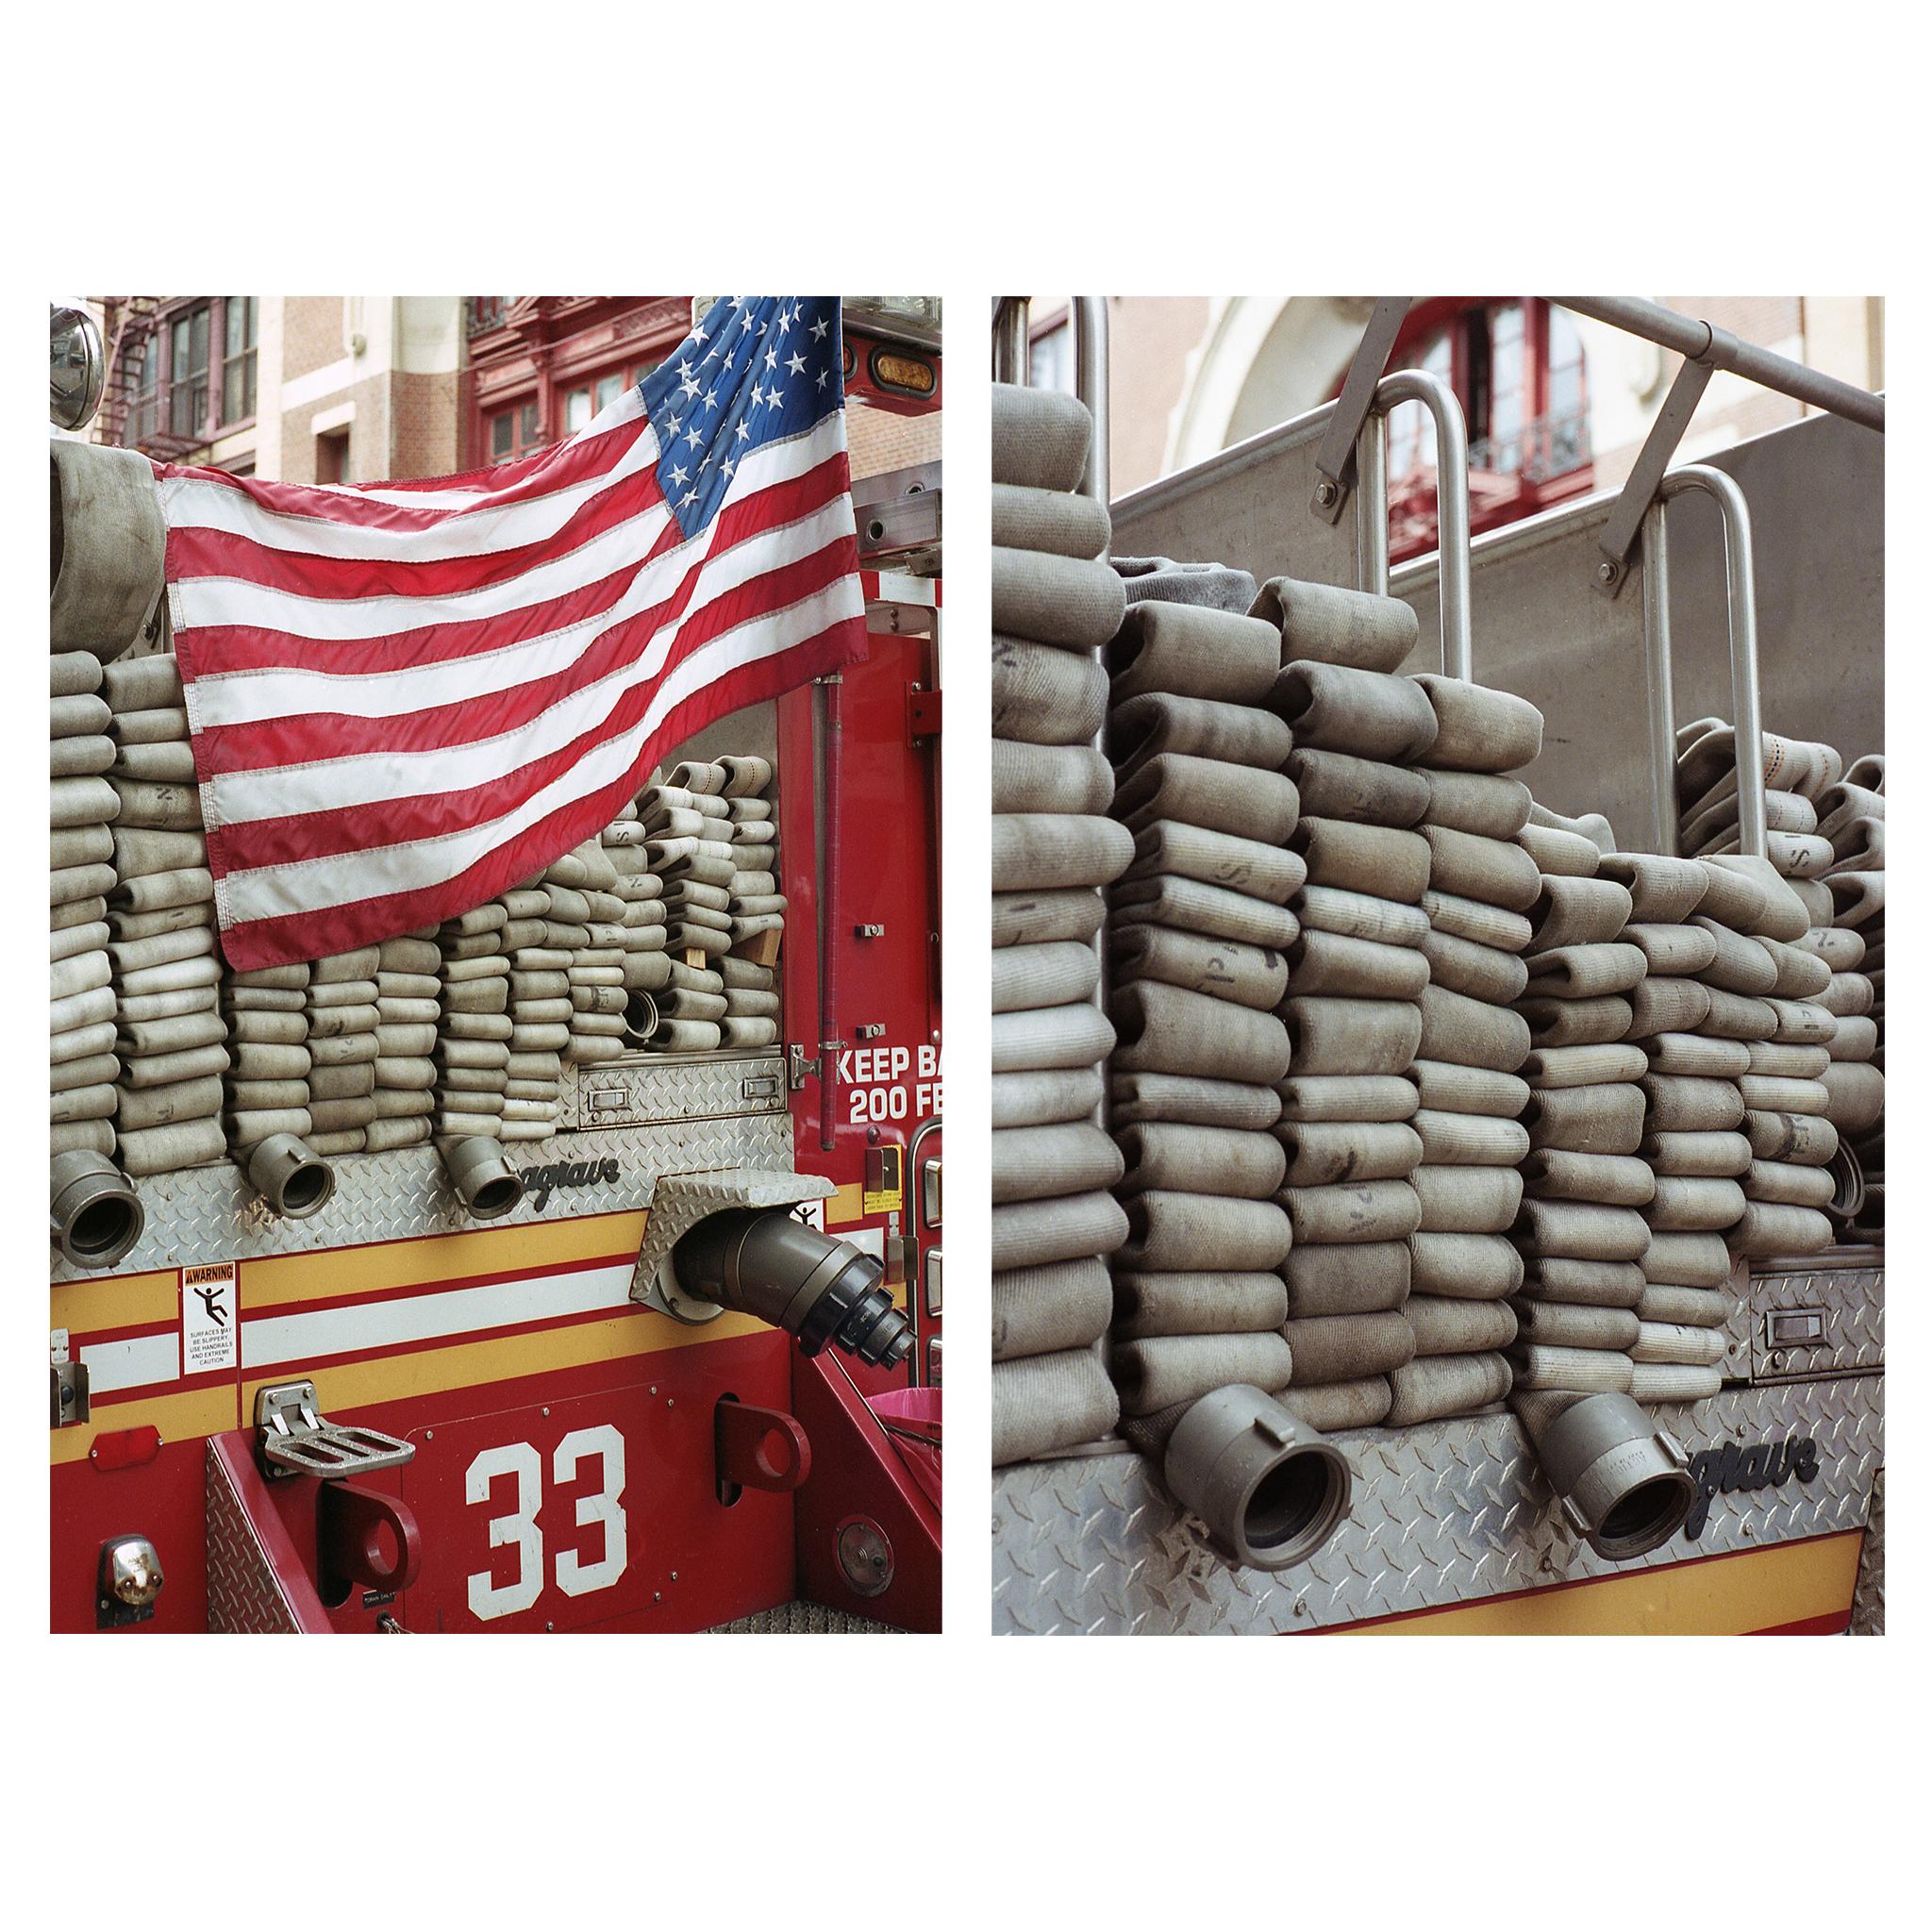 Fire Truck Collage.jpg